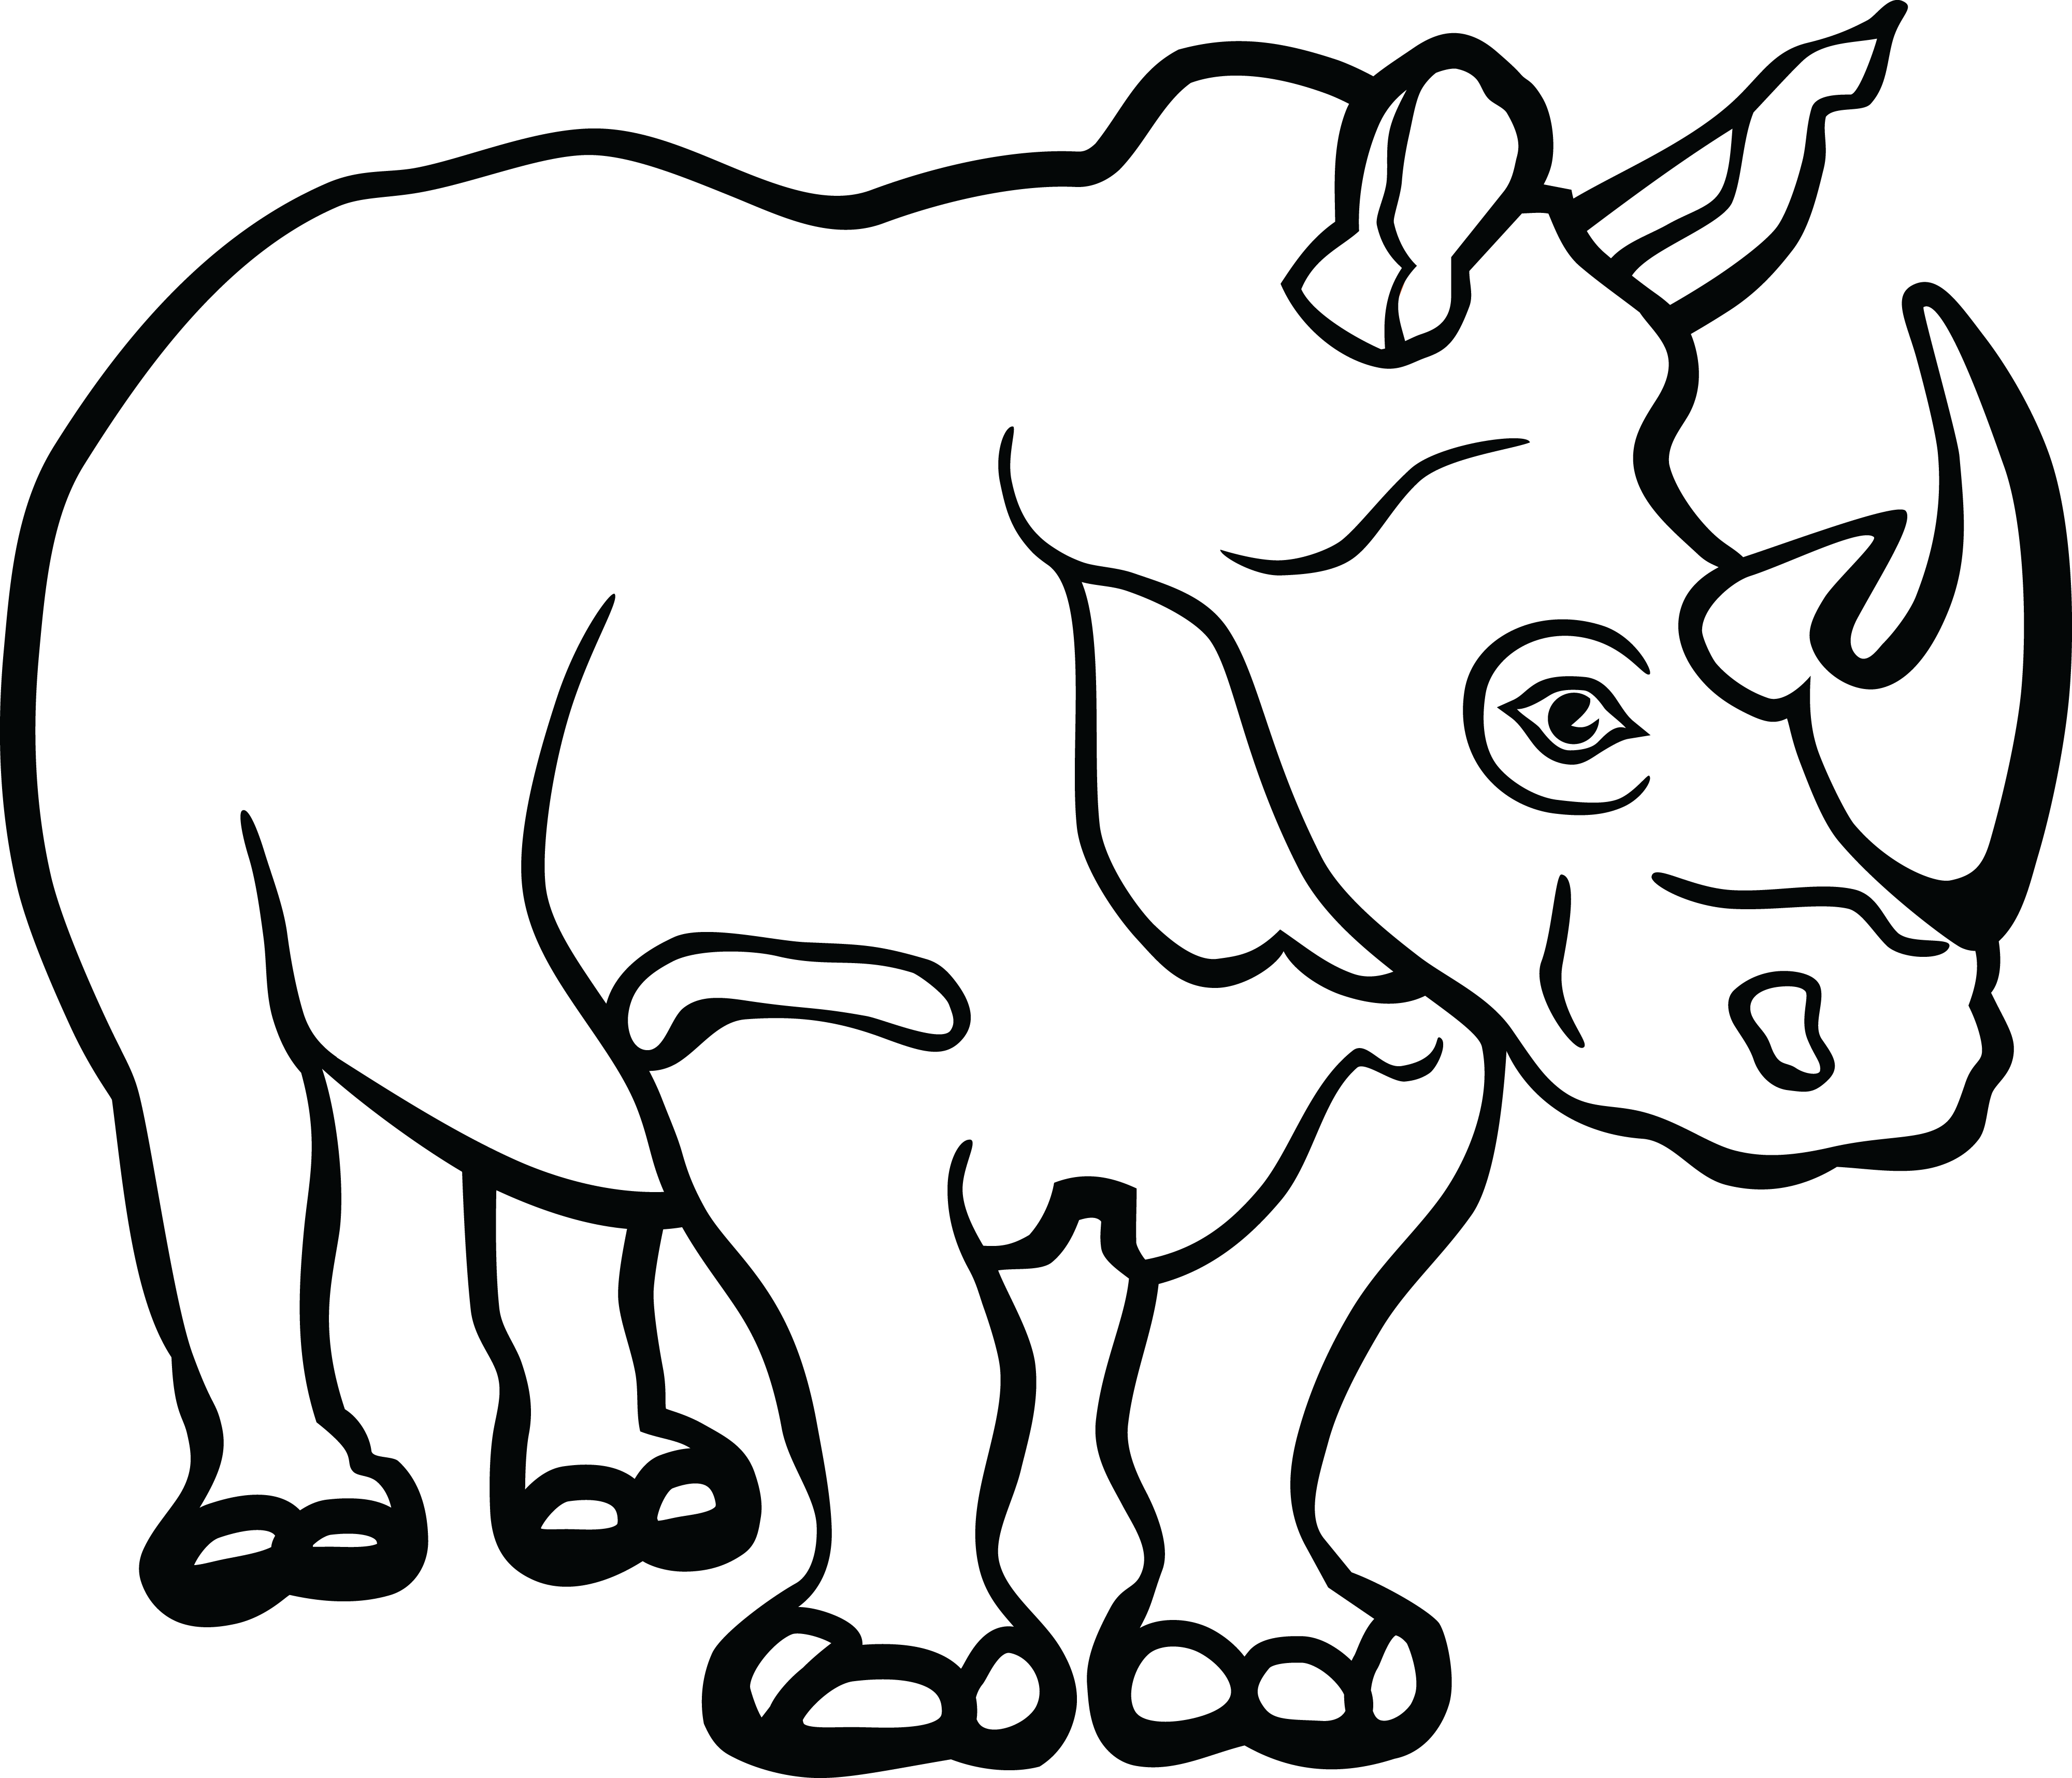 Black vs white rhino clipart png transparent stock Rhino Clipart Black And White | Free download best Rhino Clipart ... png transparent stock